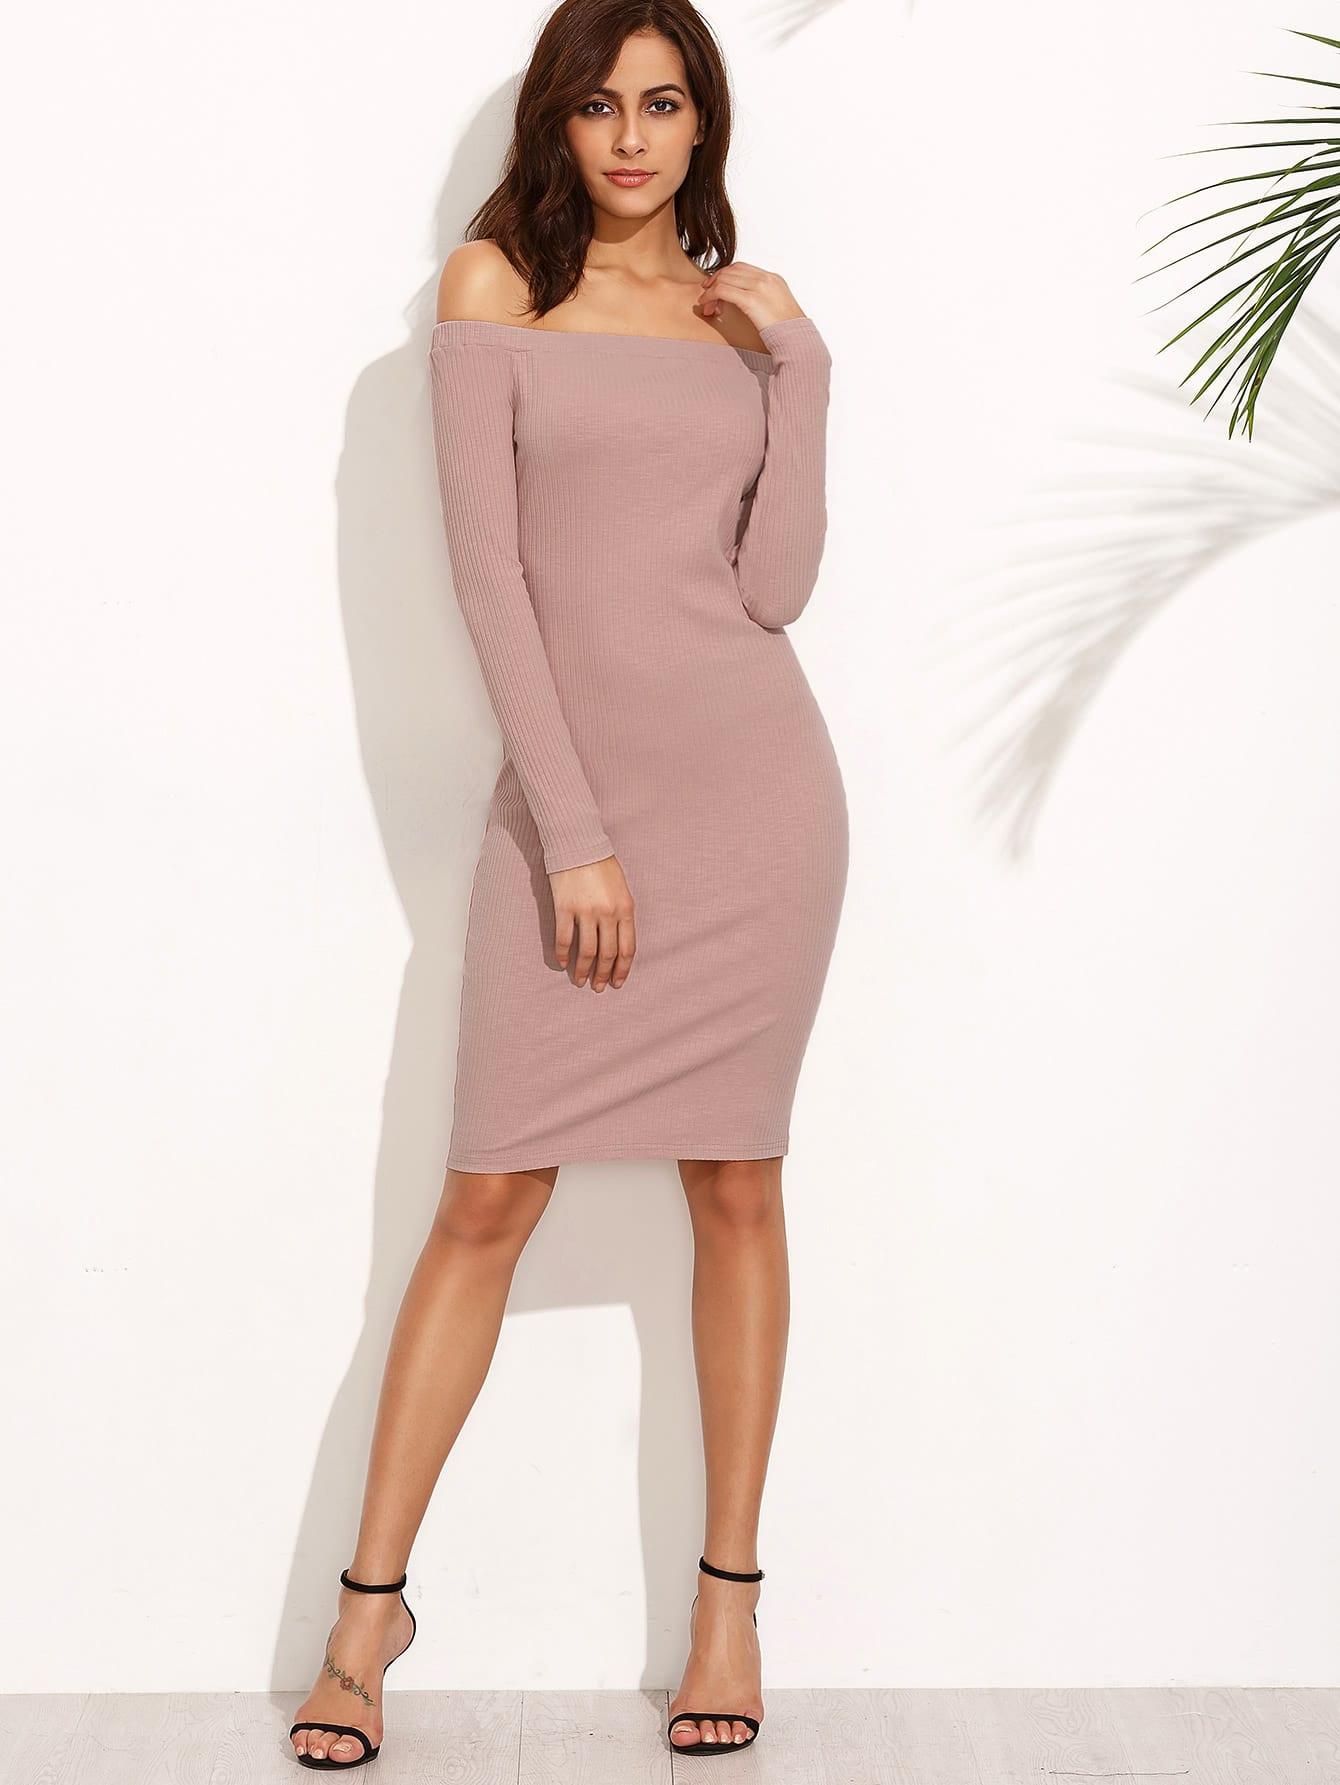 Bardot Ribbed Pencil Dress dress160727712